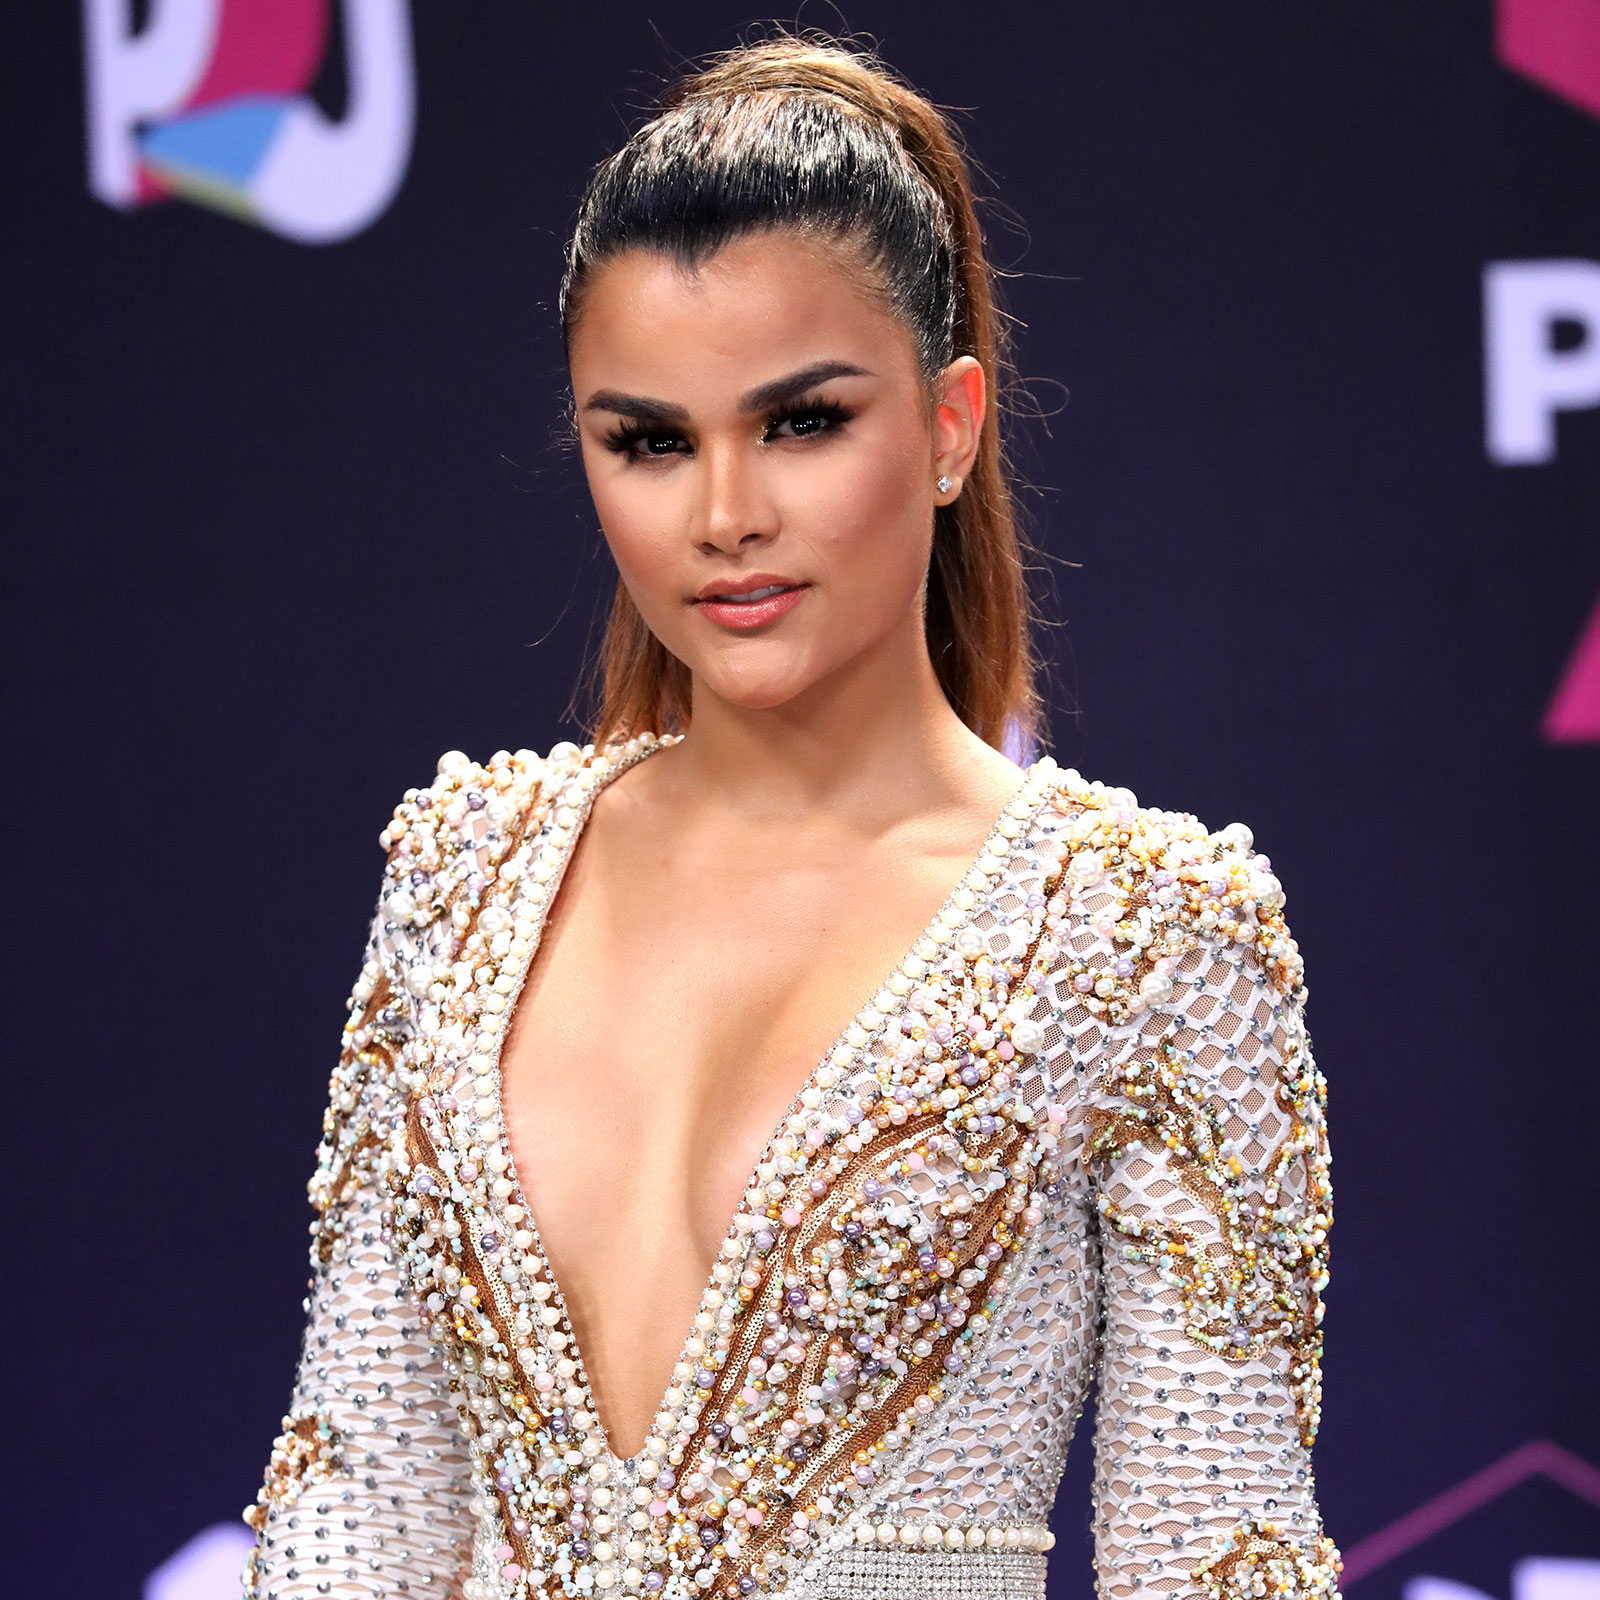 Clarissa Molina, looks, premios juventud, peinado